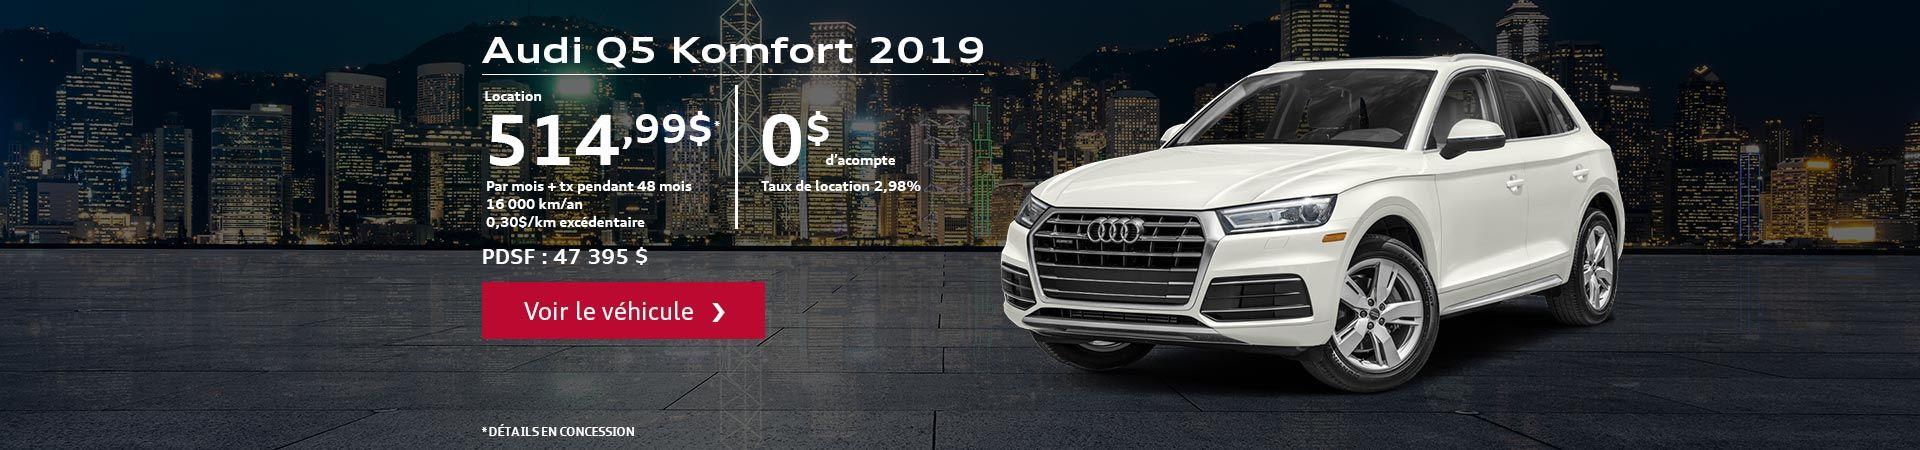 Q5 komfort 2019